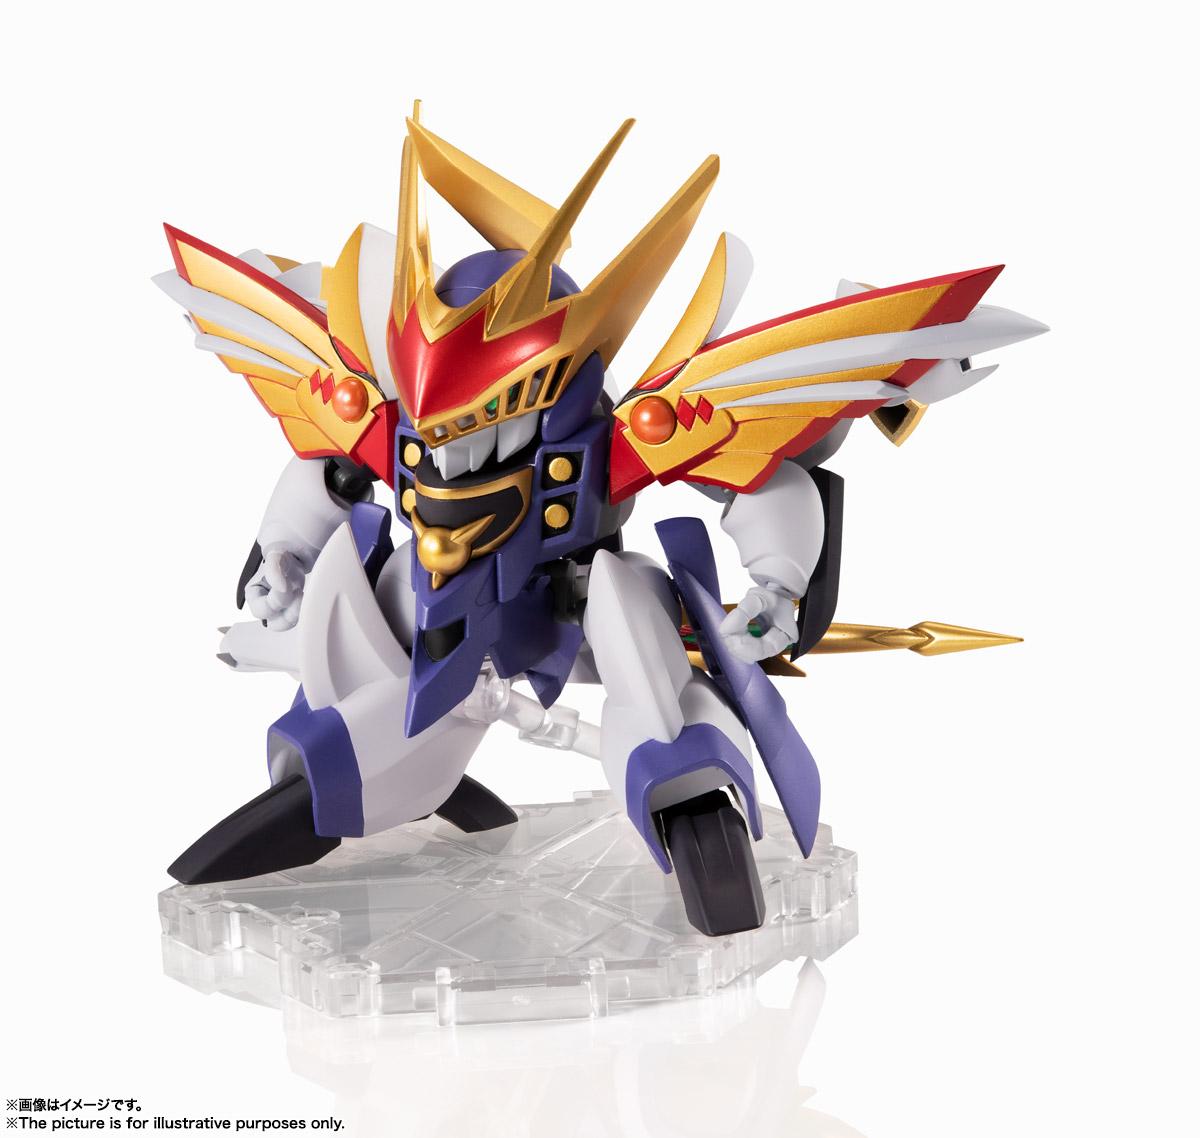 NXEDGE STYLE[MASHIN UNIT]『聖龍丸』魔神英雄伝ワタル 可動フィギュア-001